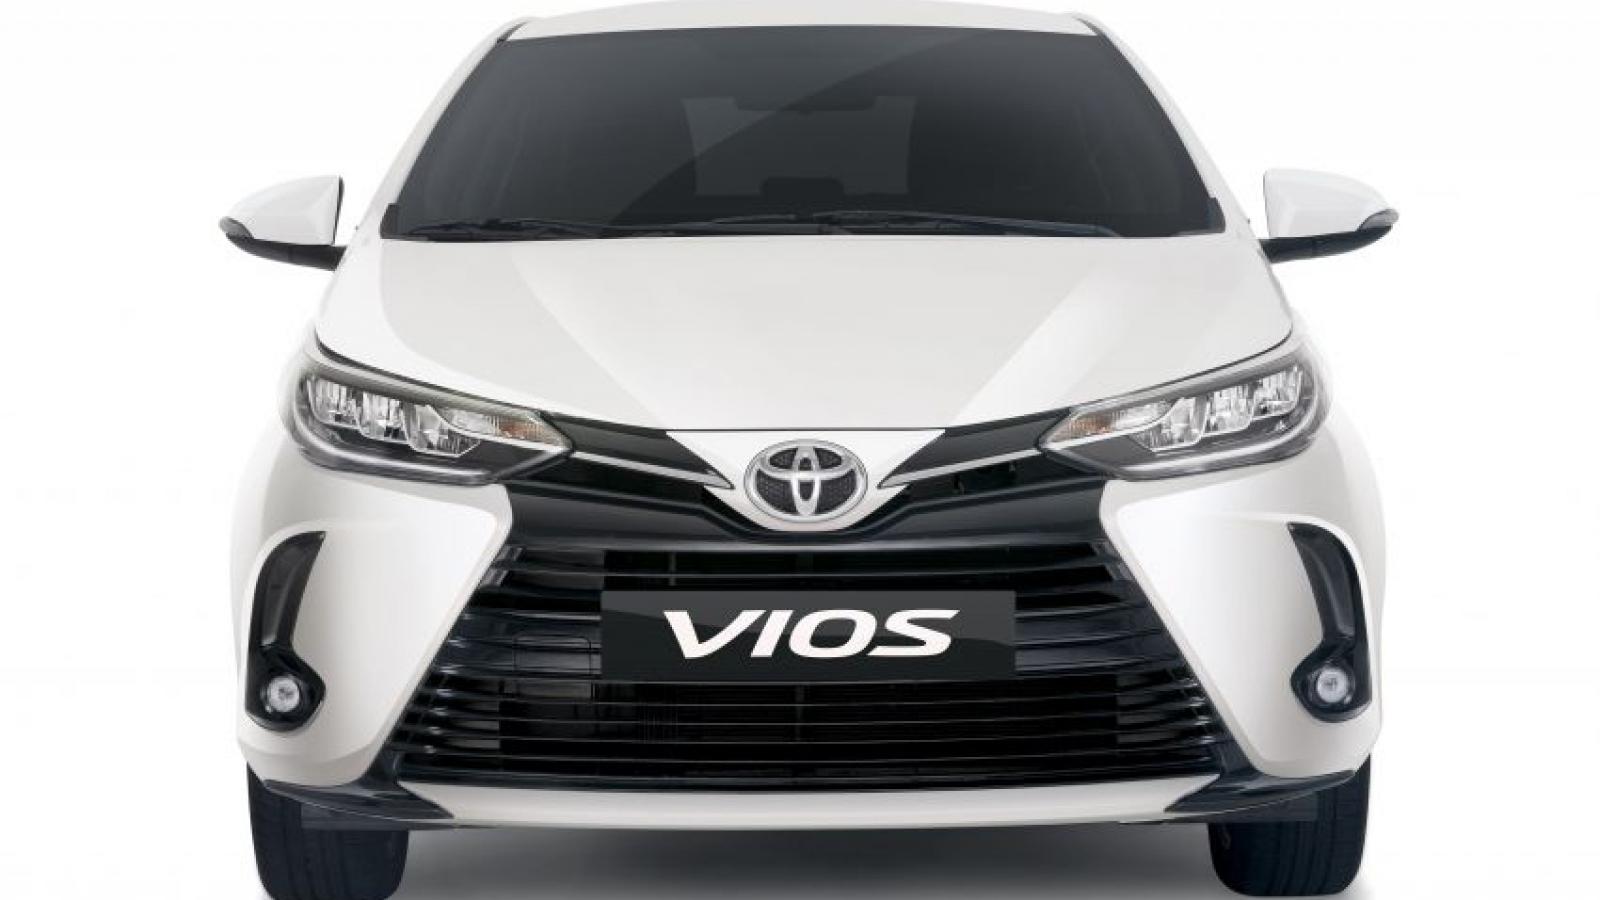 Khám phá Toyota Vios 2021 vừa ra mắt